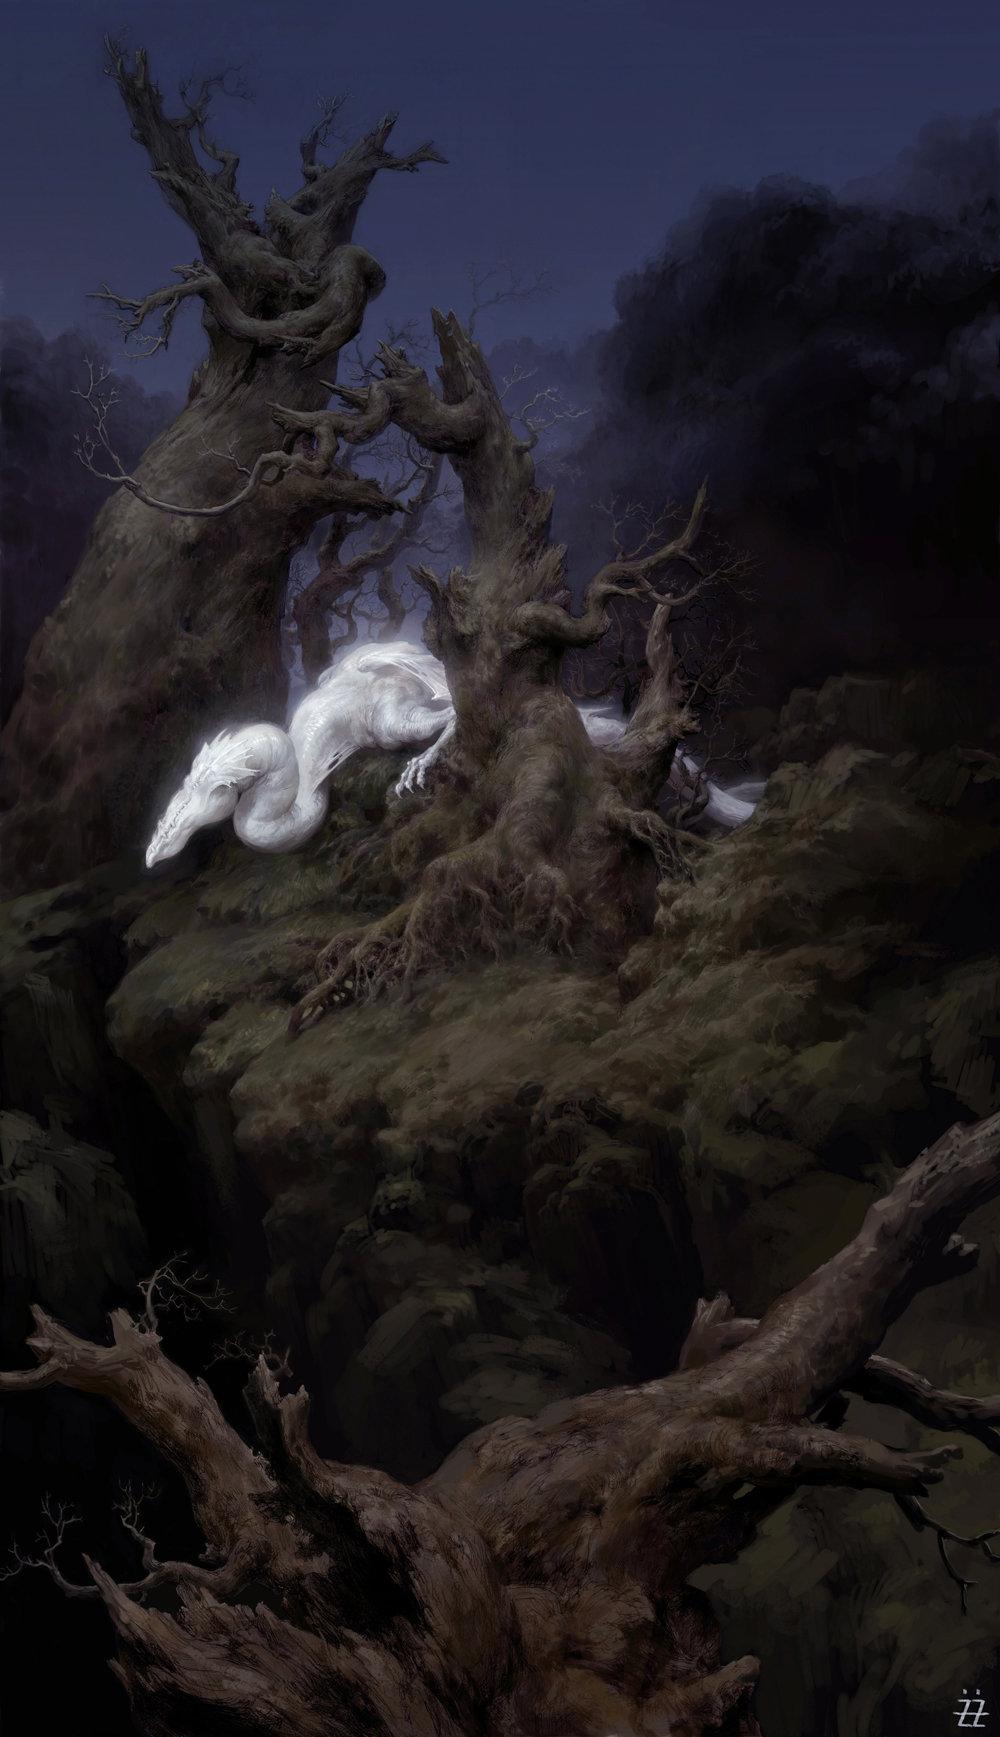 https://cdna.artstation.com/p/assets/images/images/000/108/314/large/tianhua-xu-white-dragon2.jpg?1443932439